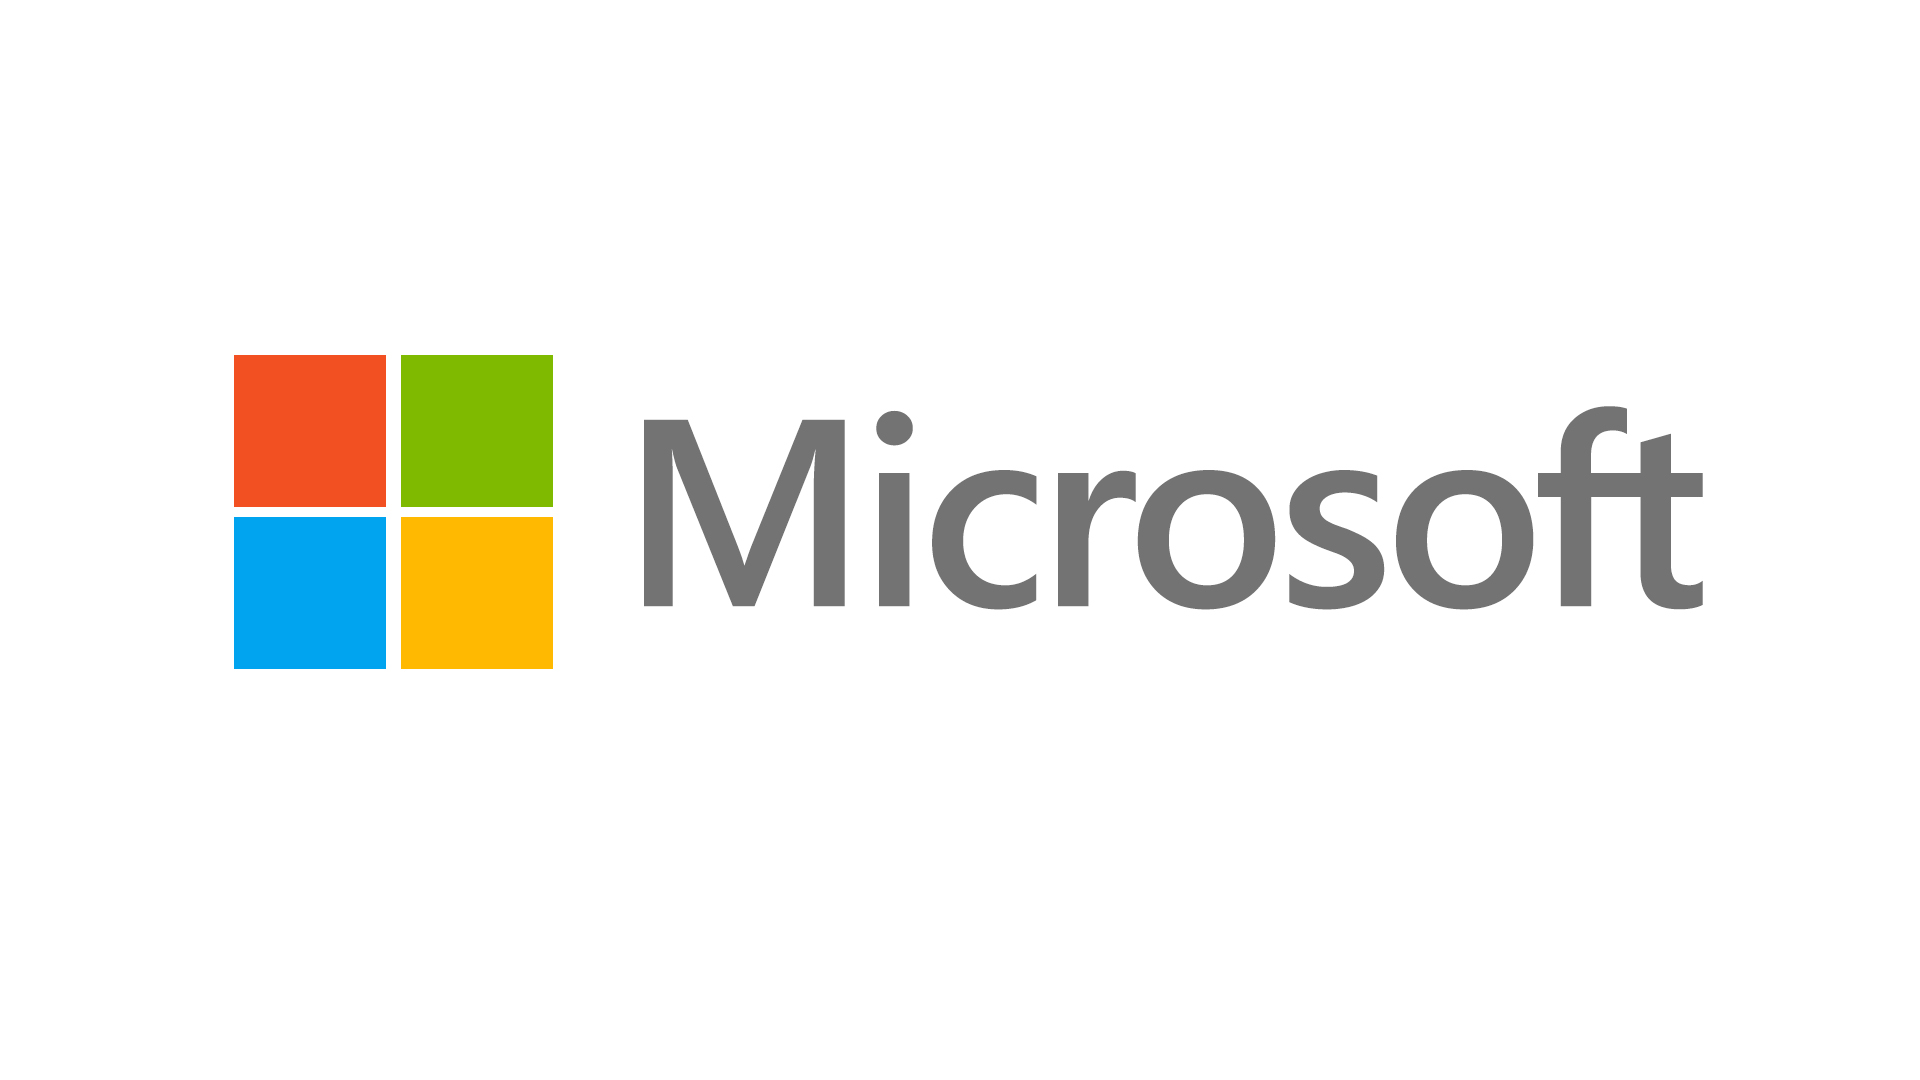 Photoshop PSD Template: Microsoft Logo • AquuL